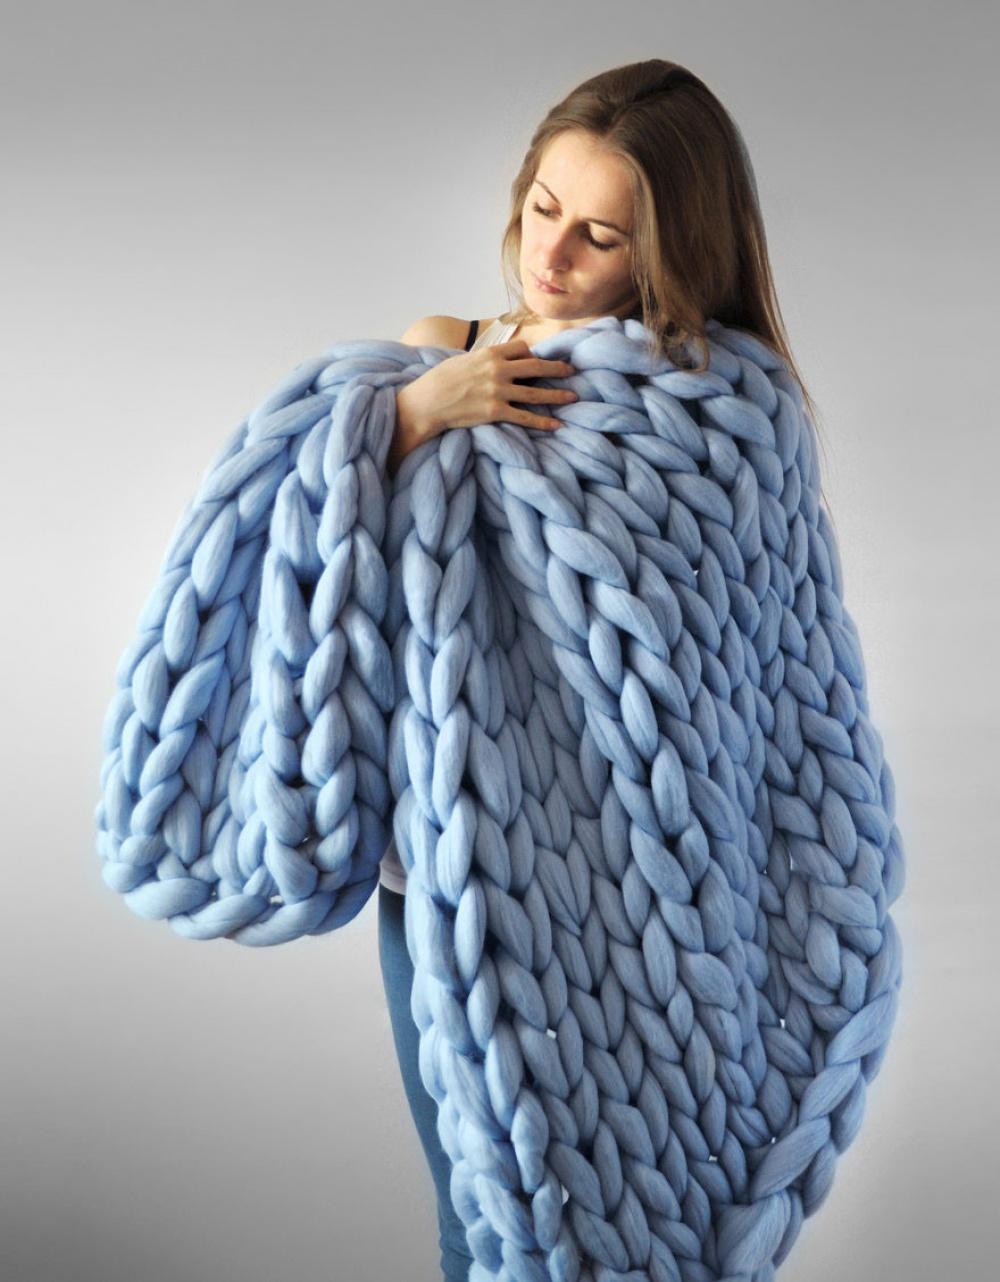 10 Arm Knitting Blanket Patterns - The Funky Stitch